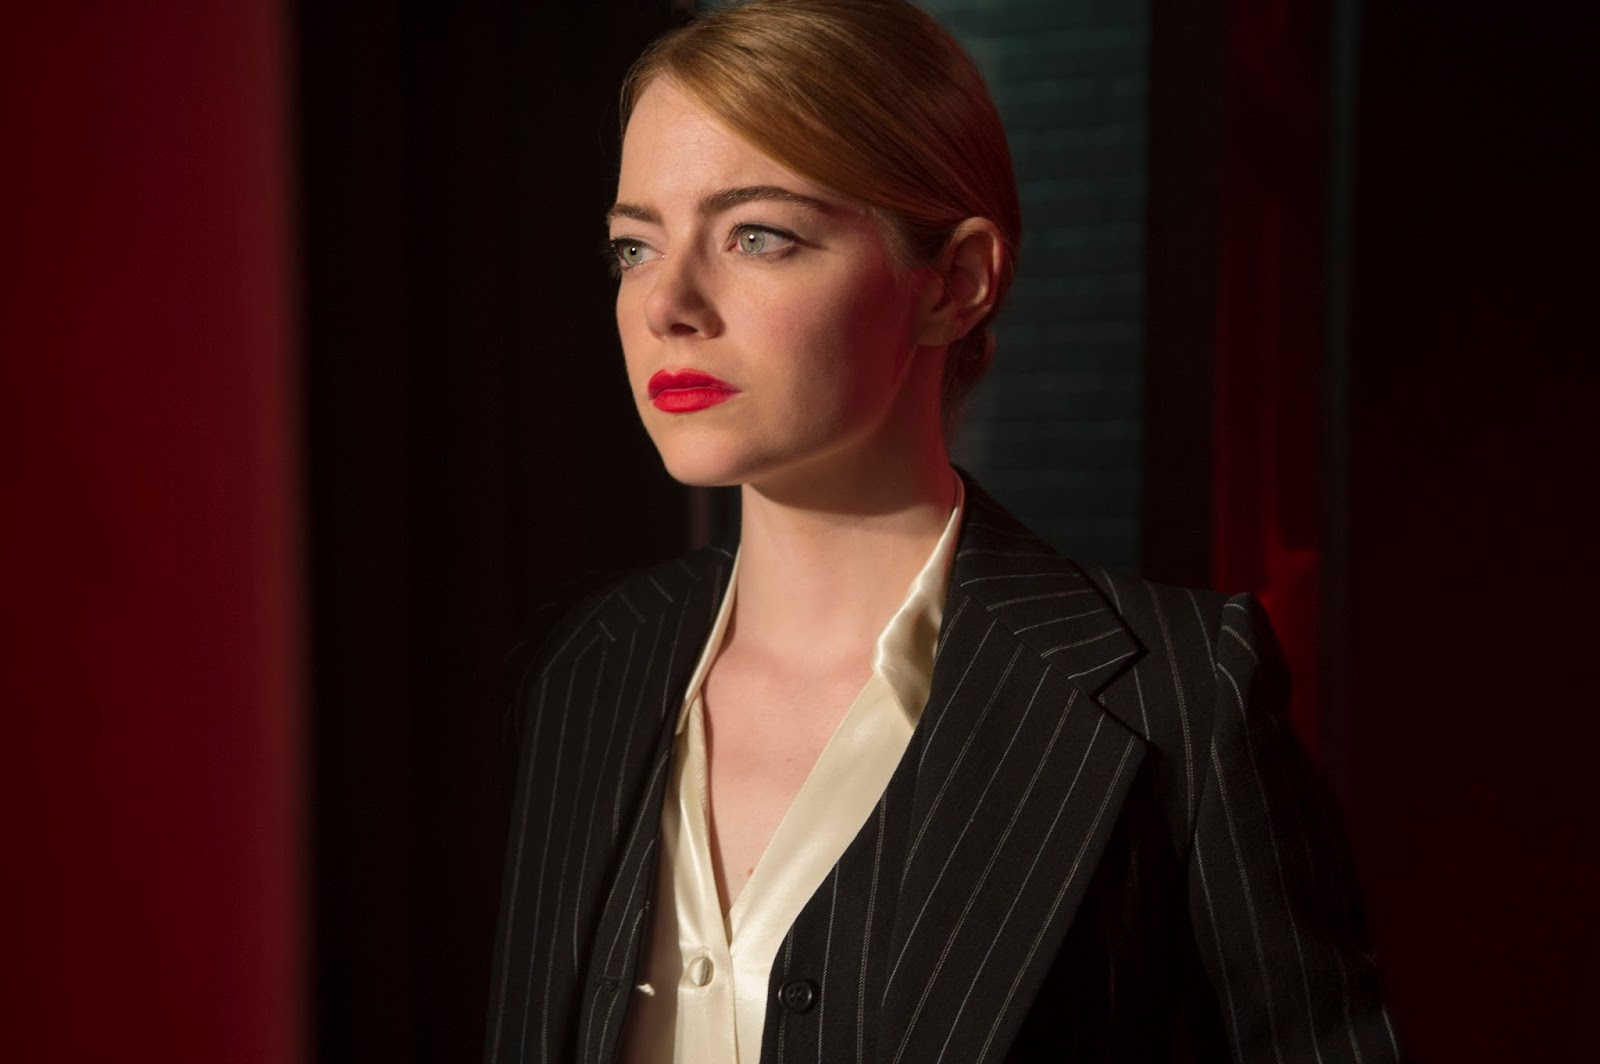 Emma Stone - LaLaLand